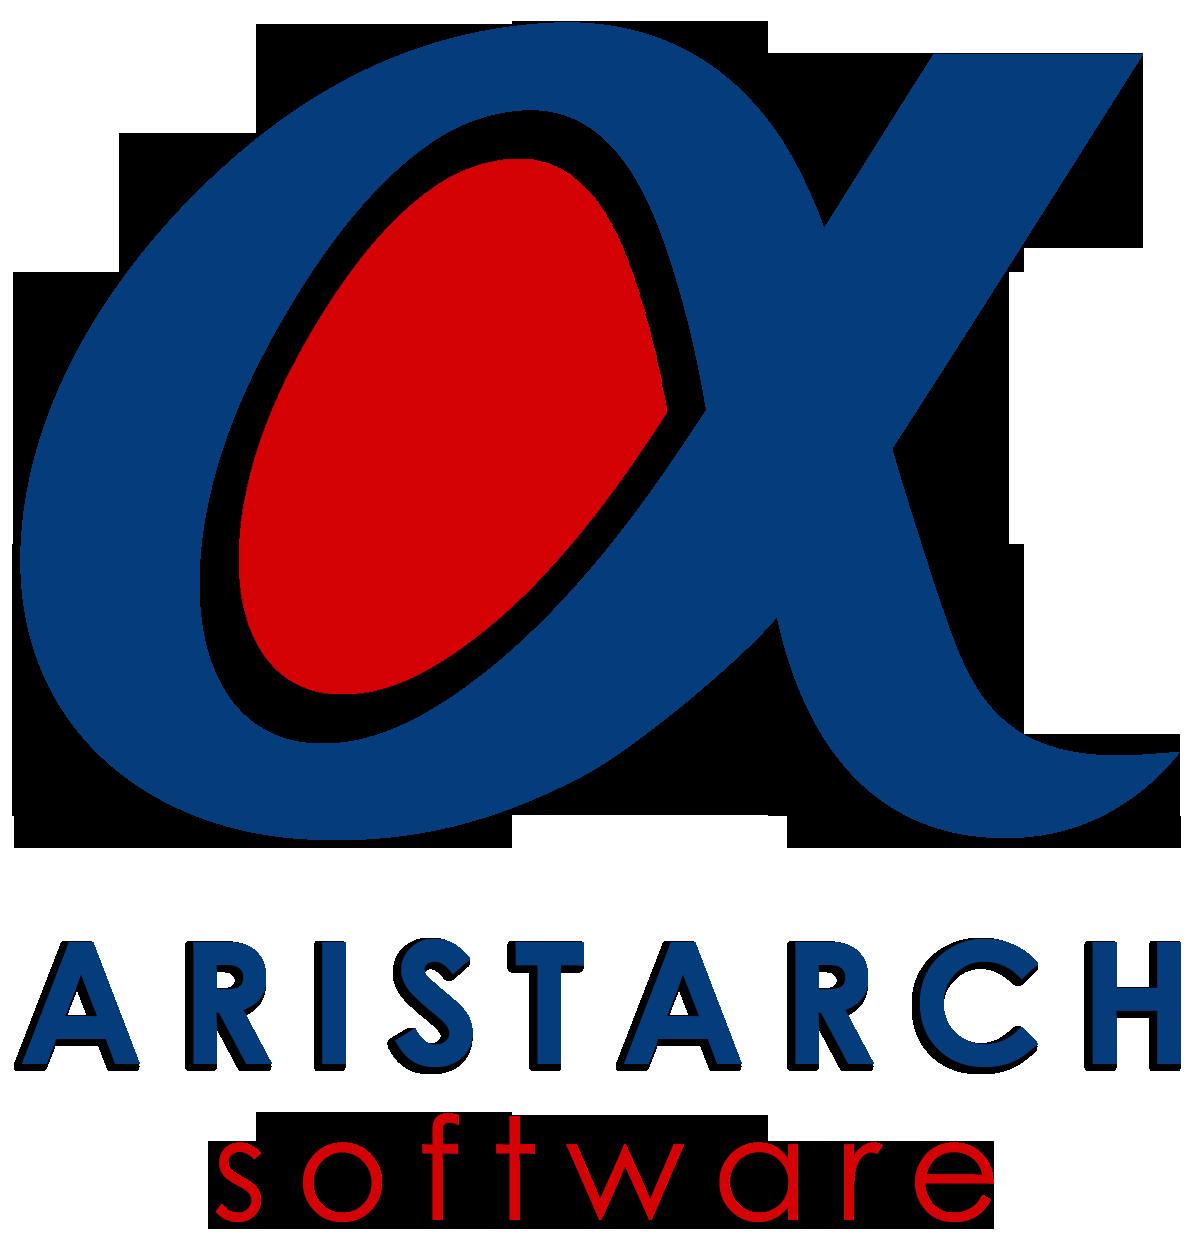 ARISTARCH Software